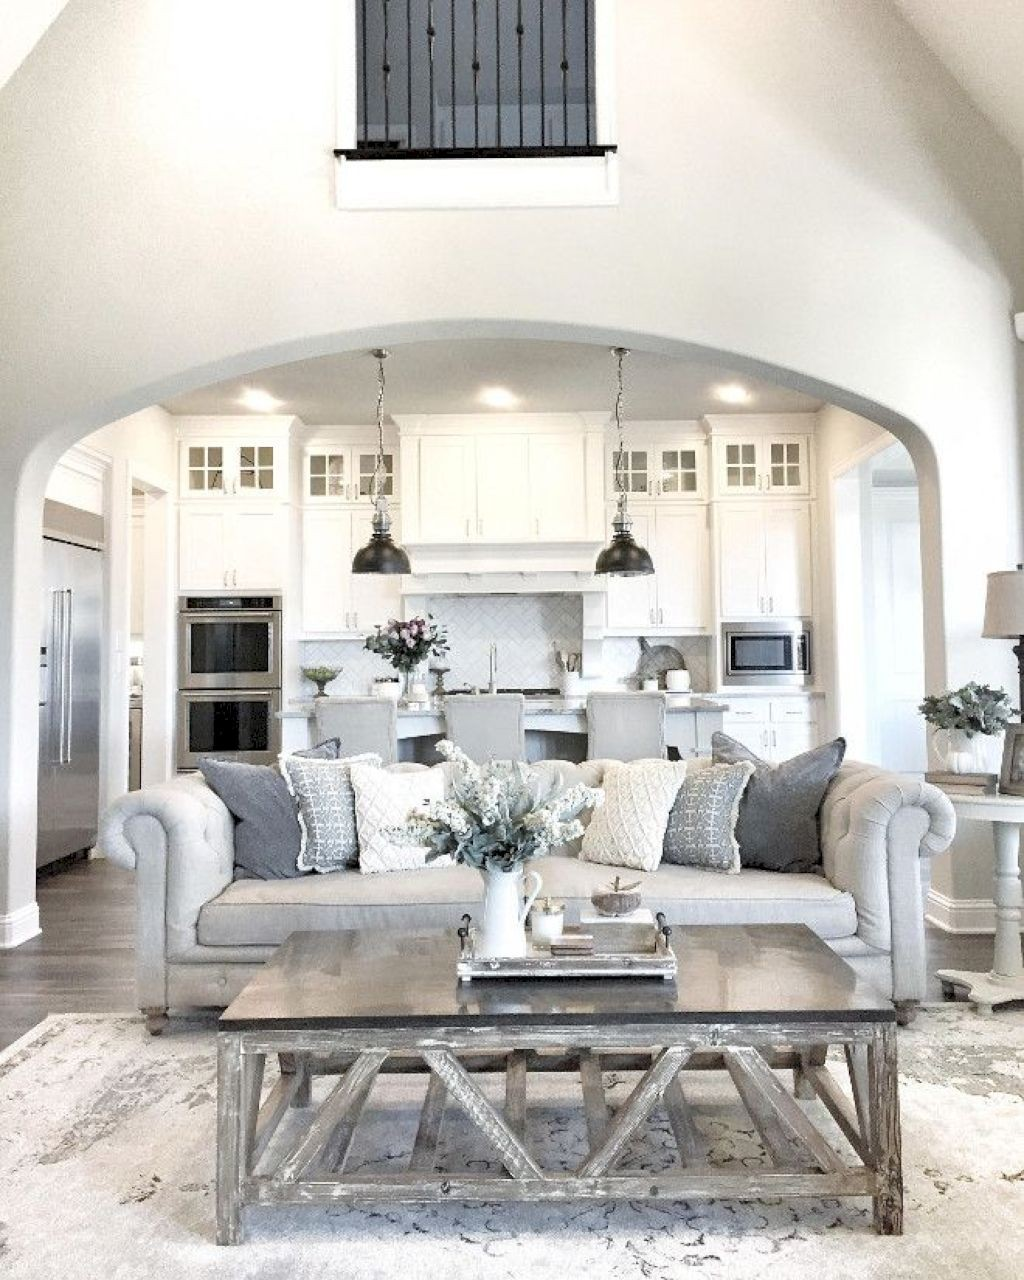 34+Comfortable Farmhouse Living Room Ideas